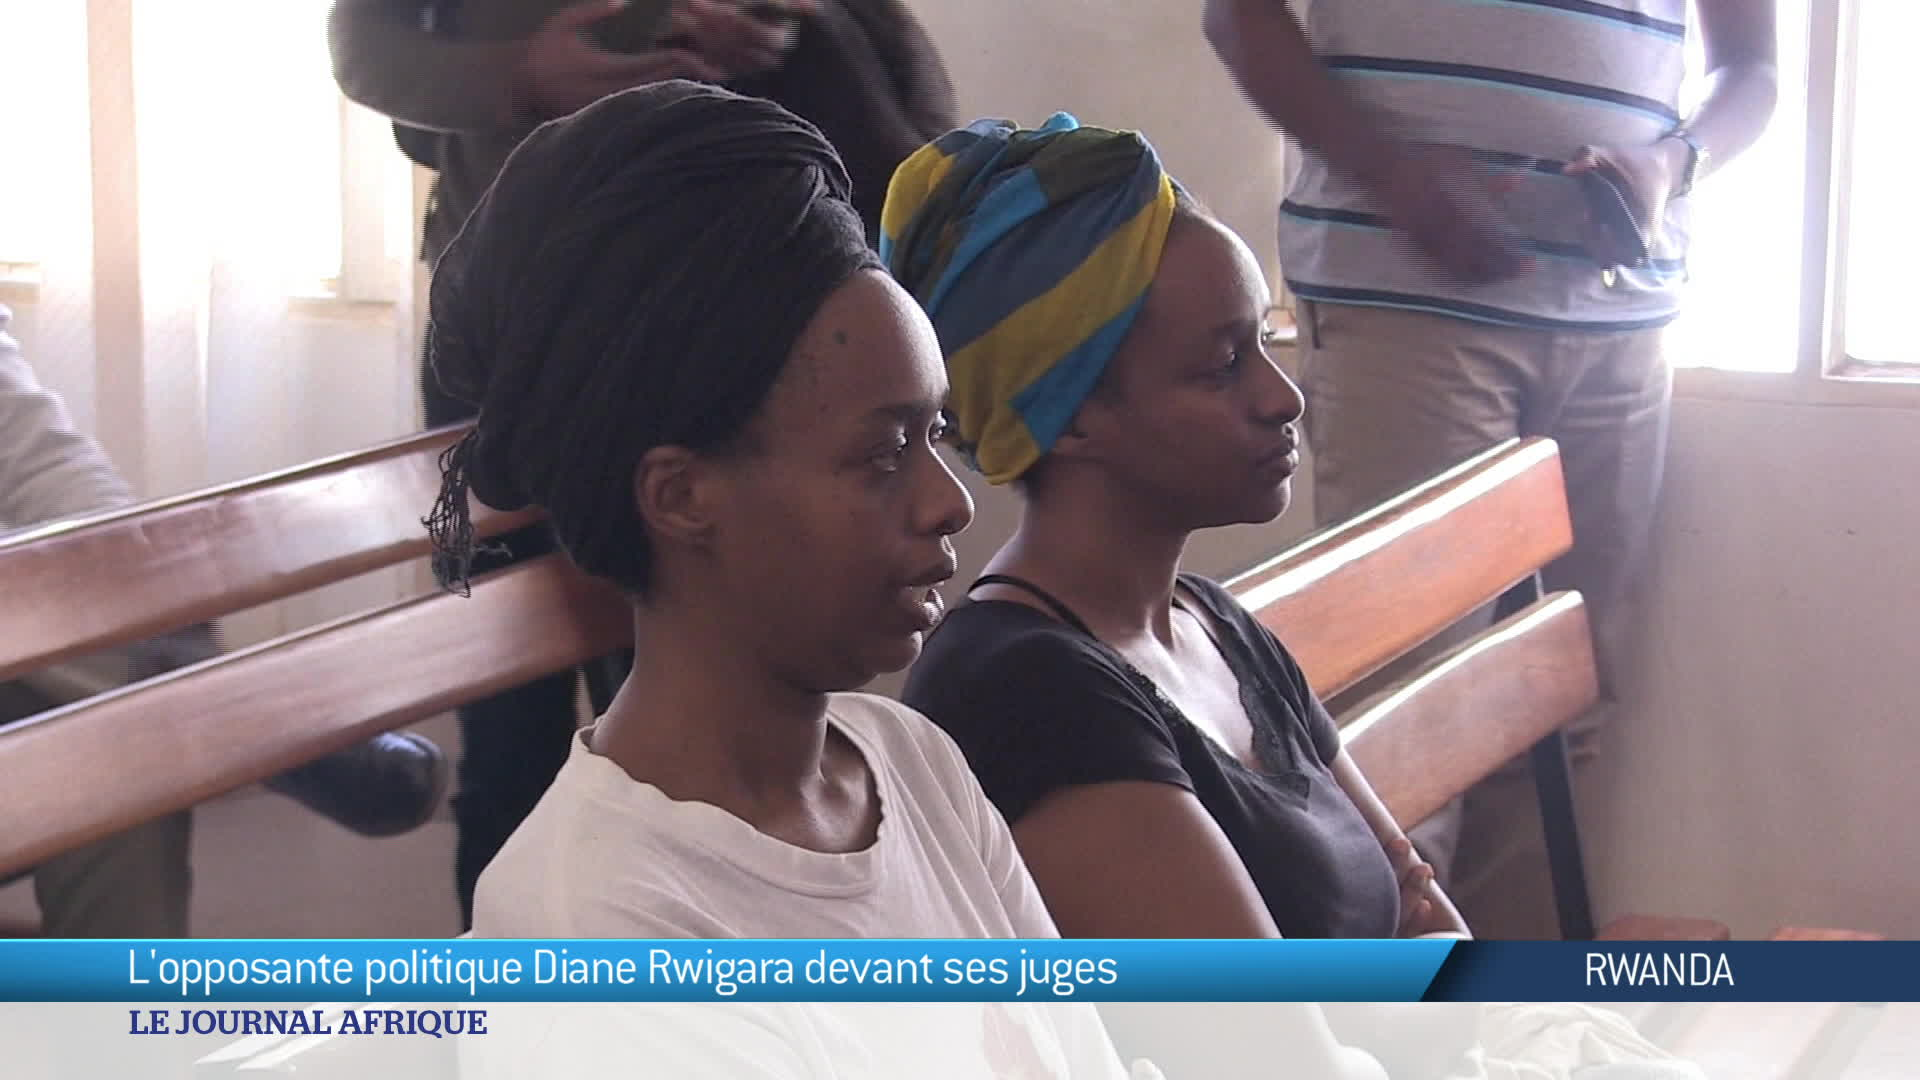 Rwanda : l'opposante politique Diane Rwigara devant ses juges